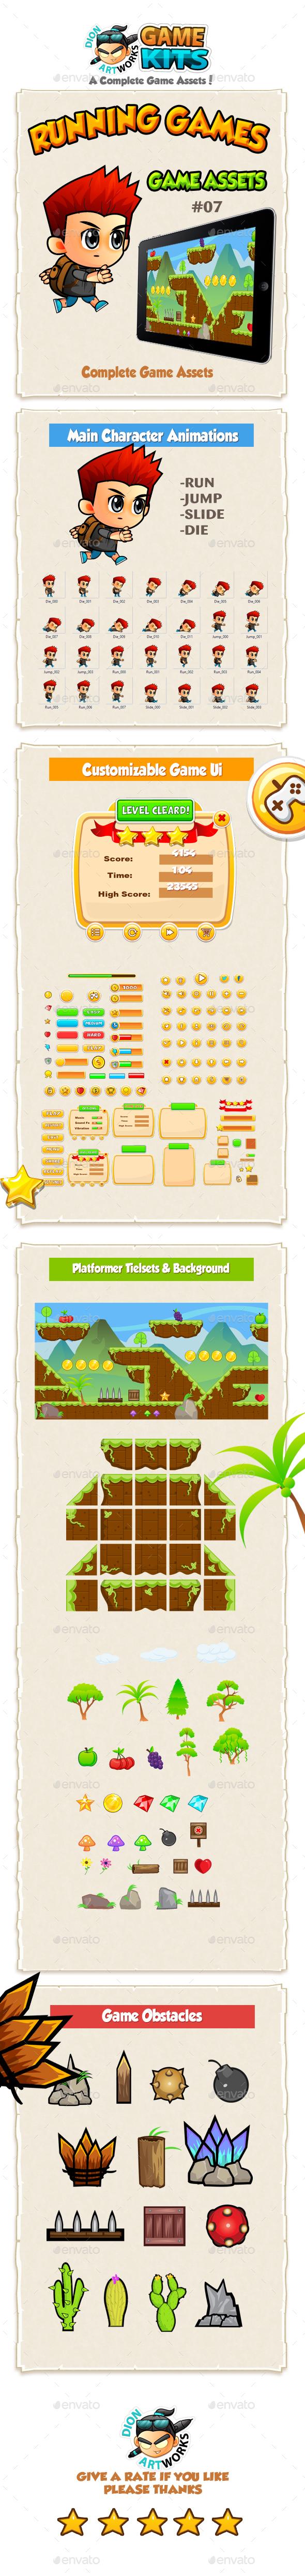 Running Boy Game Assets 07 - Game Kits Game Assets